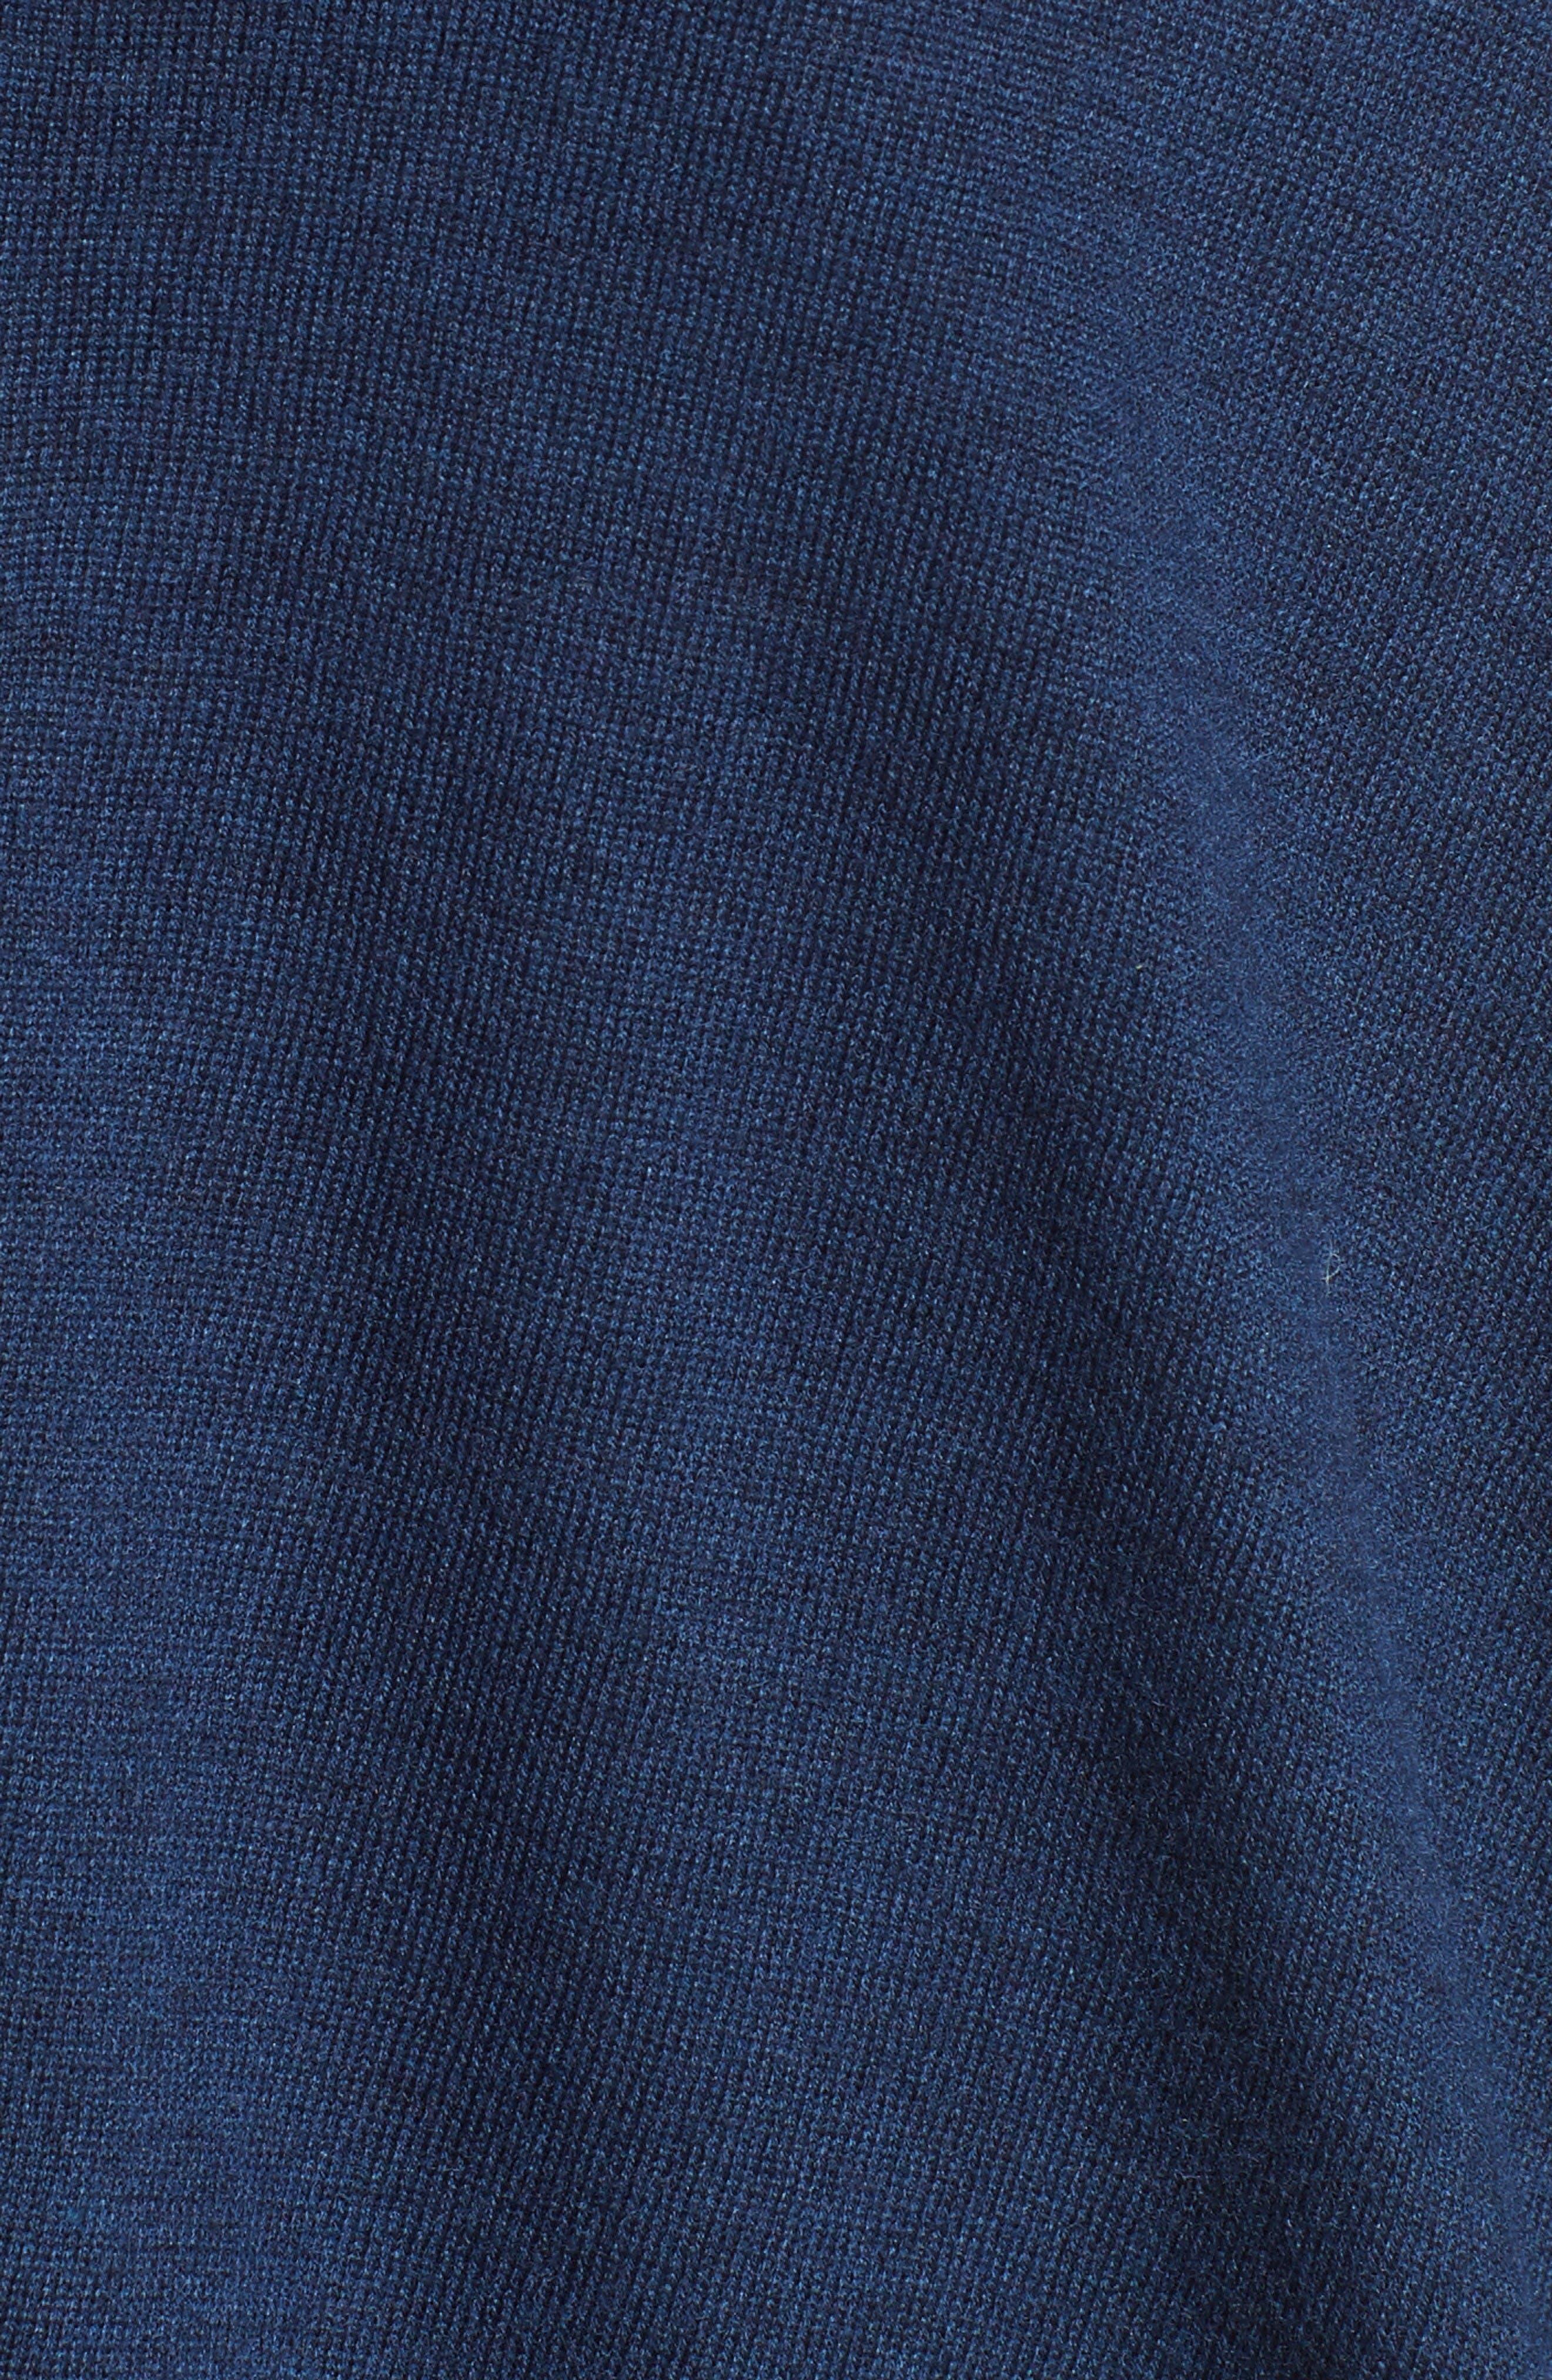 Marlis Knit Cardigan,                             Alternate thumbnail 5, color,                             Dark Navy